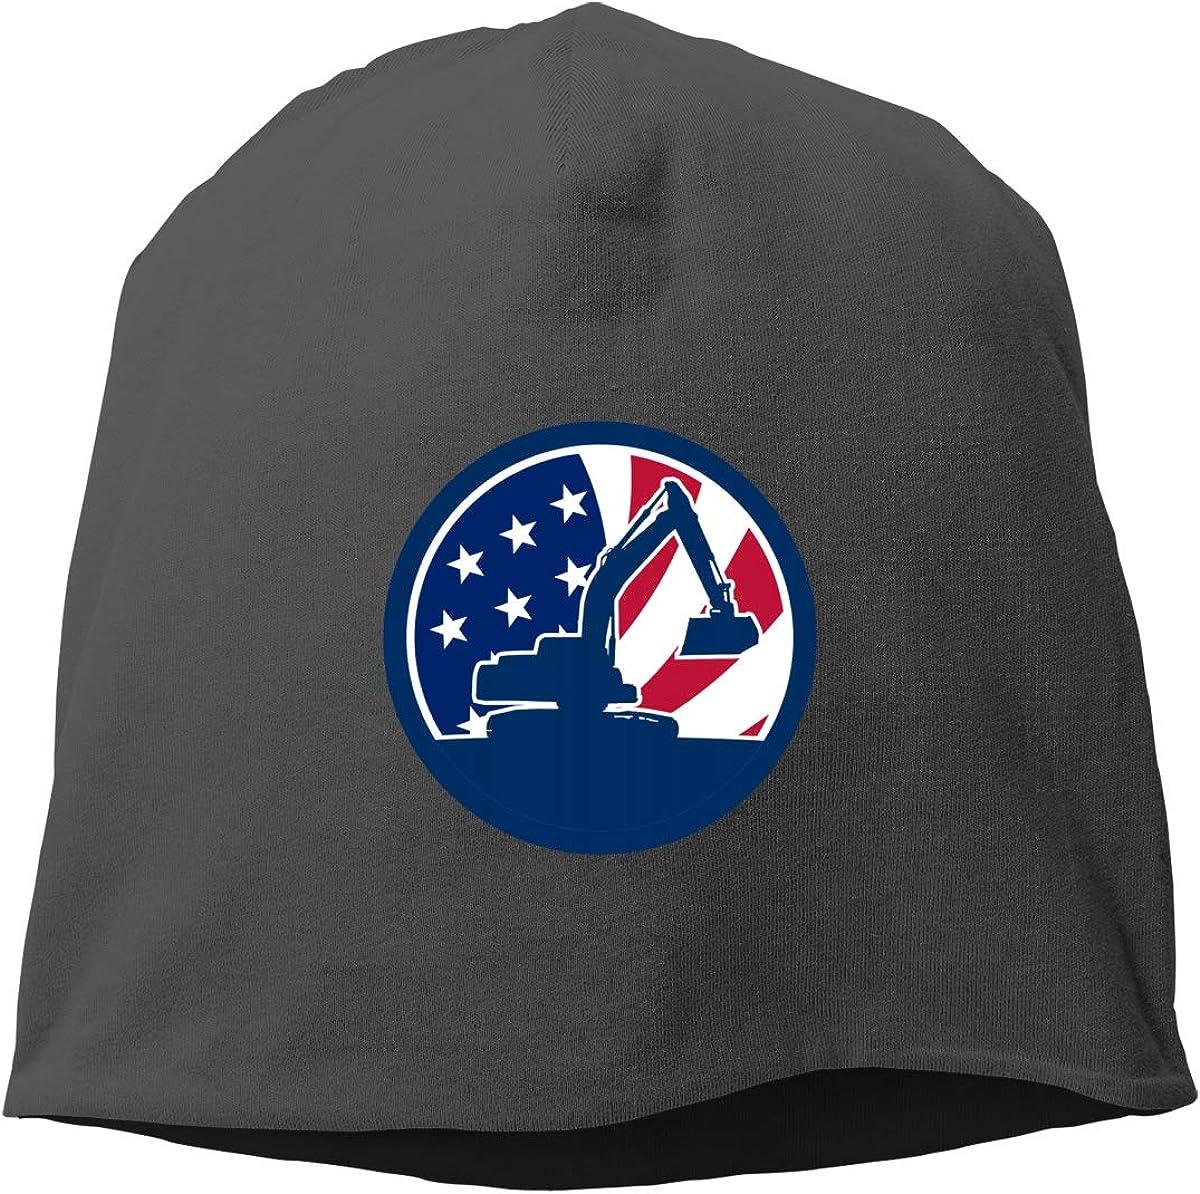 American Excavator USA Flag Skull Cap Helmet Liner Beanie Cap for Men Hip Hop Hedging Head Hat